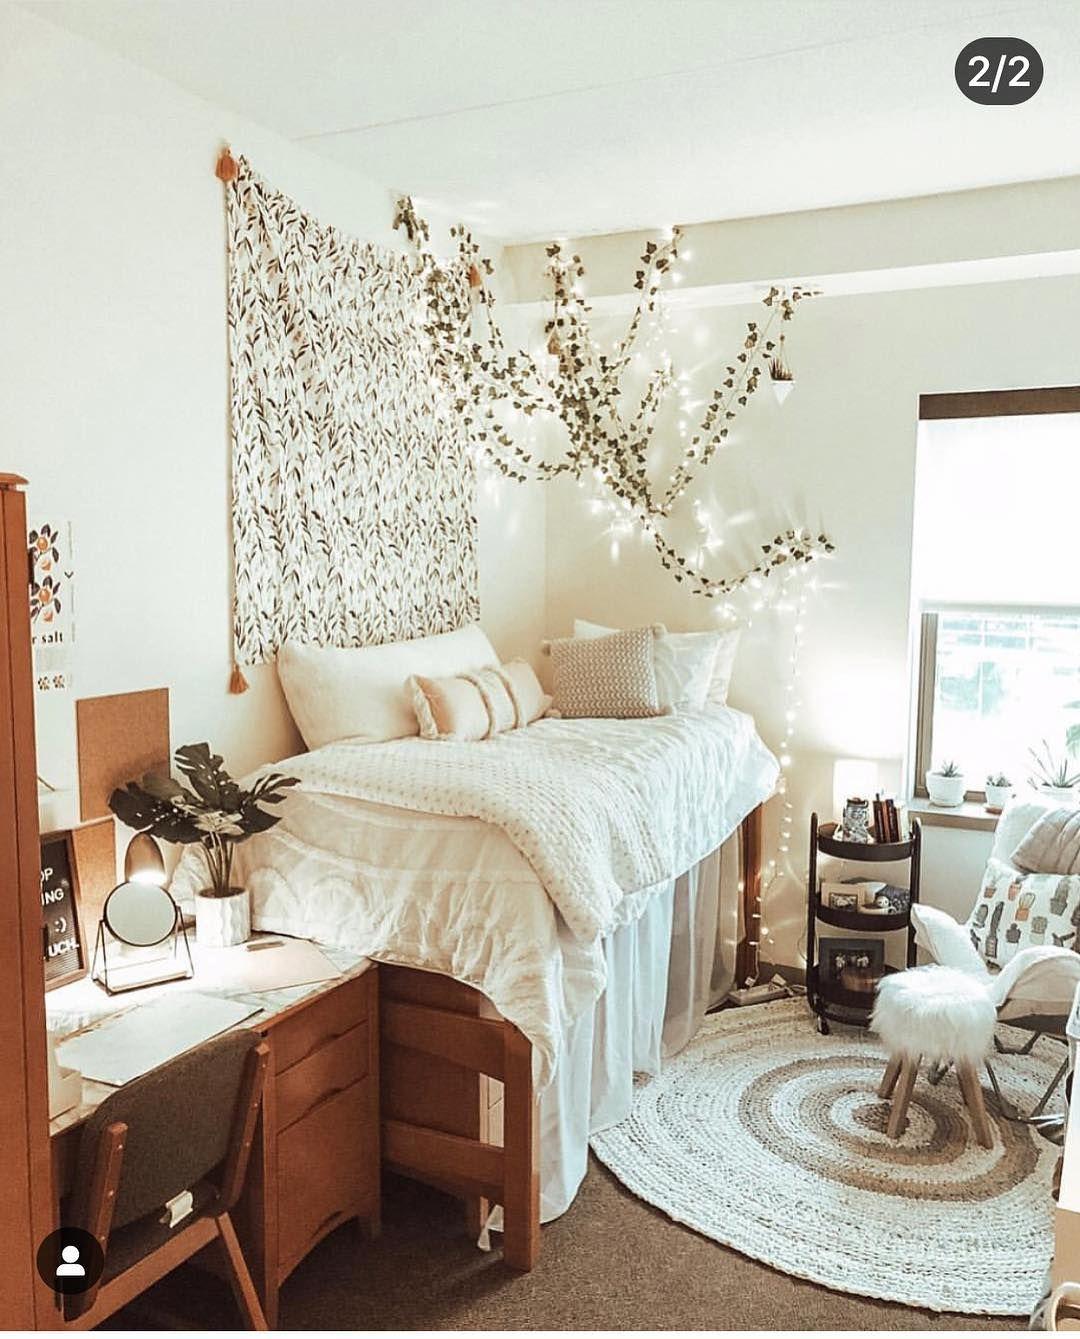 nice dorm rooms on 26 best dorm room ideas that will transform your room by sophia lee college bedroom decor beautiful dorm room cool dorm rooms 26 best dorm room ideas that will